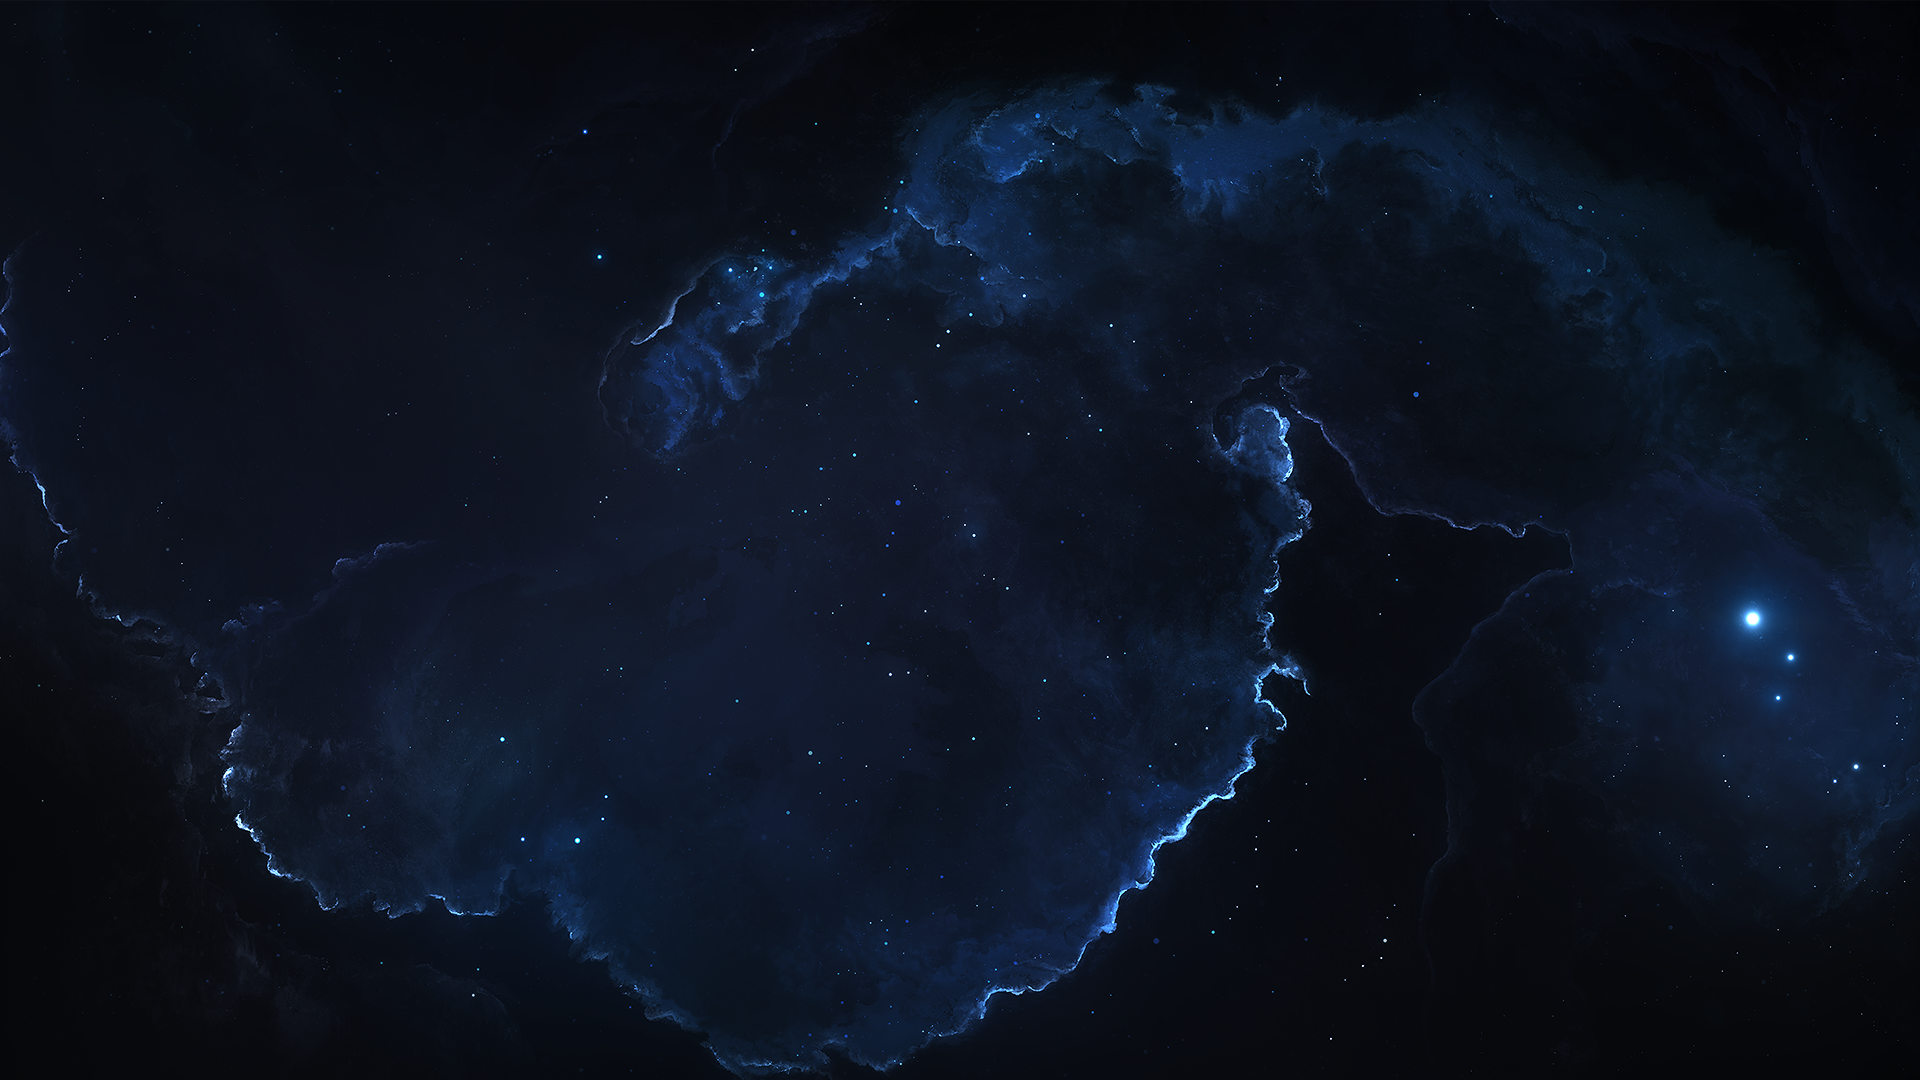 Blue Nebula Space Stars 1920x1080